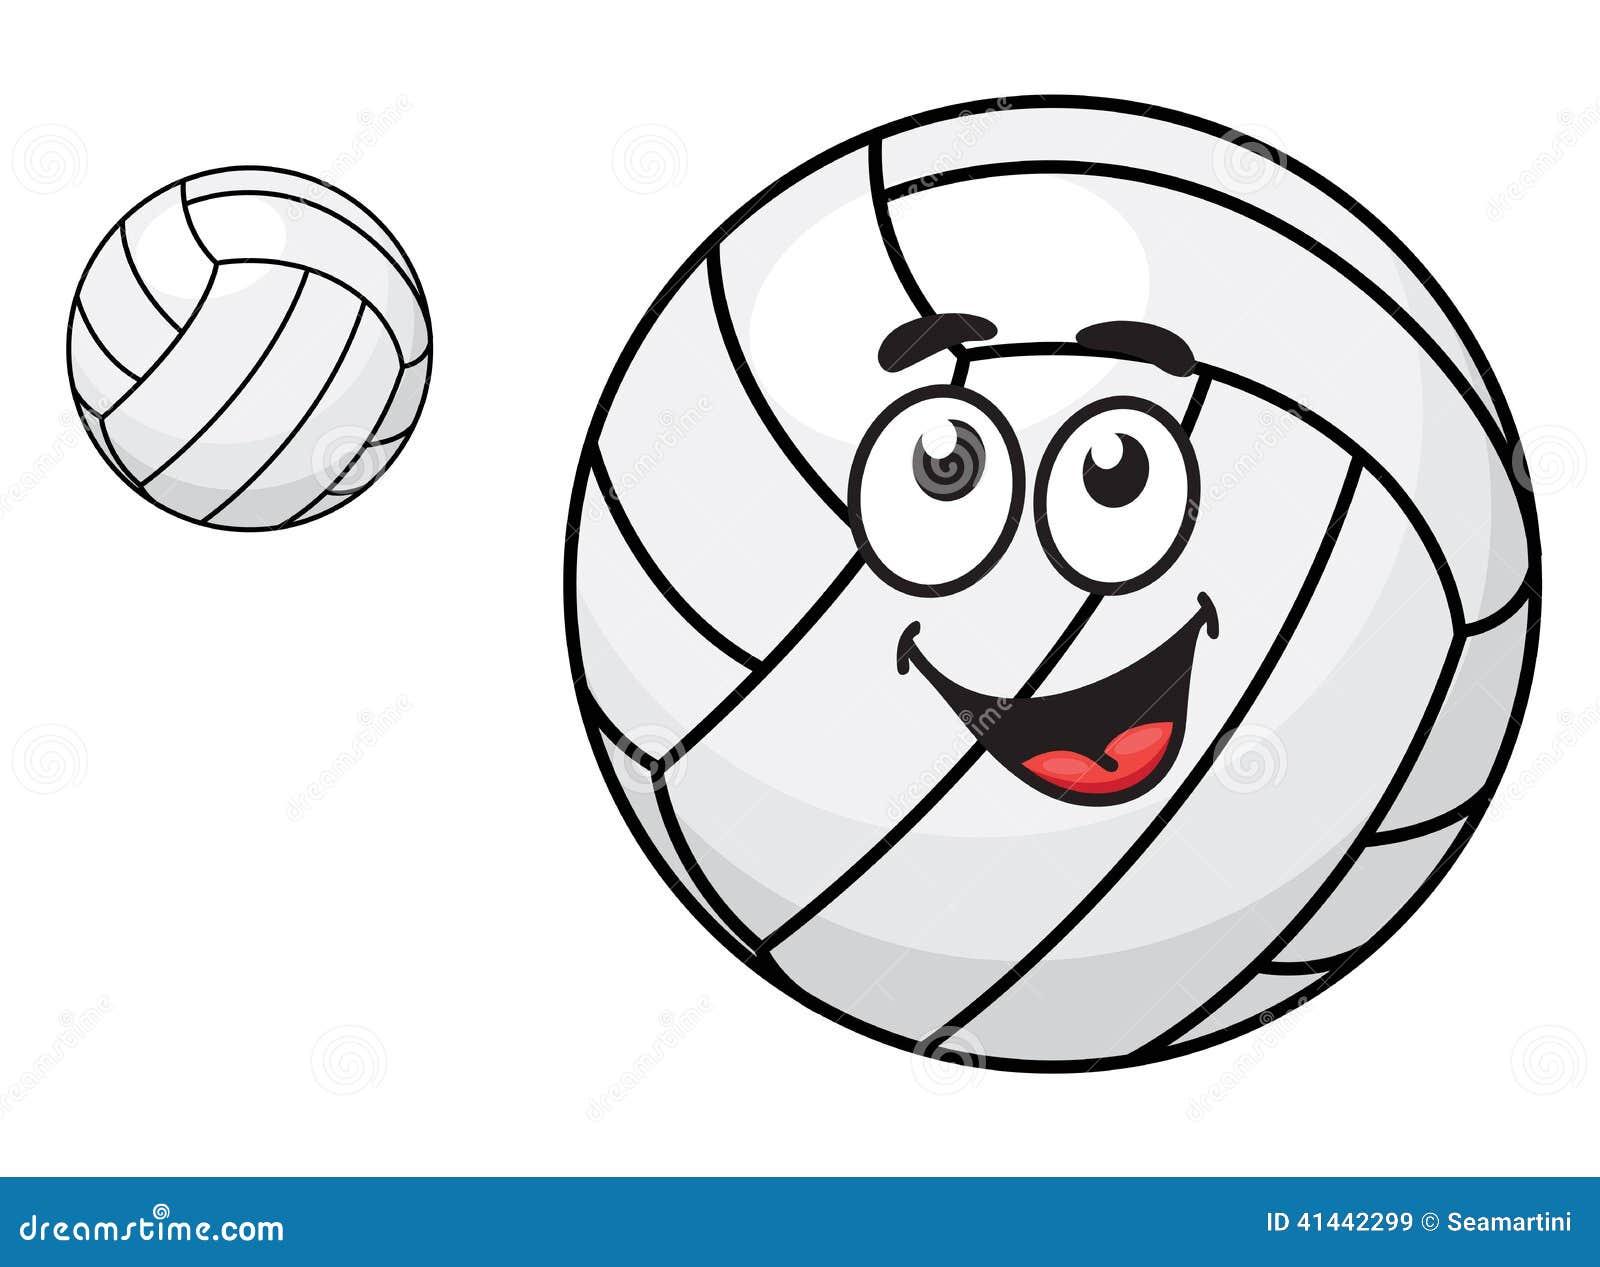 cartoon volleyball clipart - photo #49